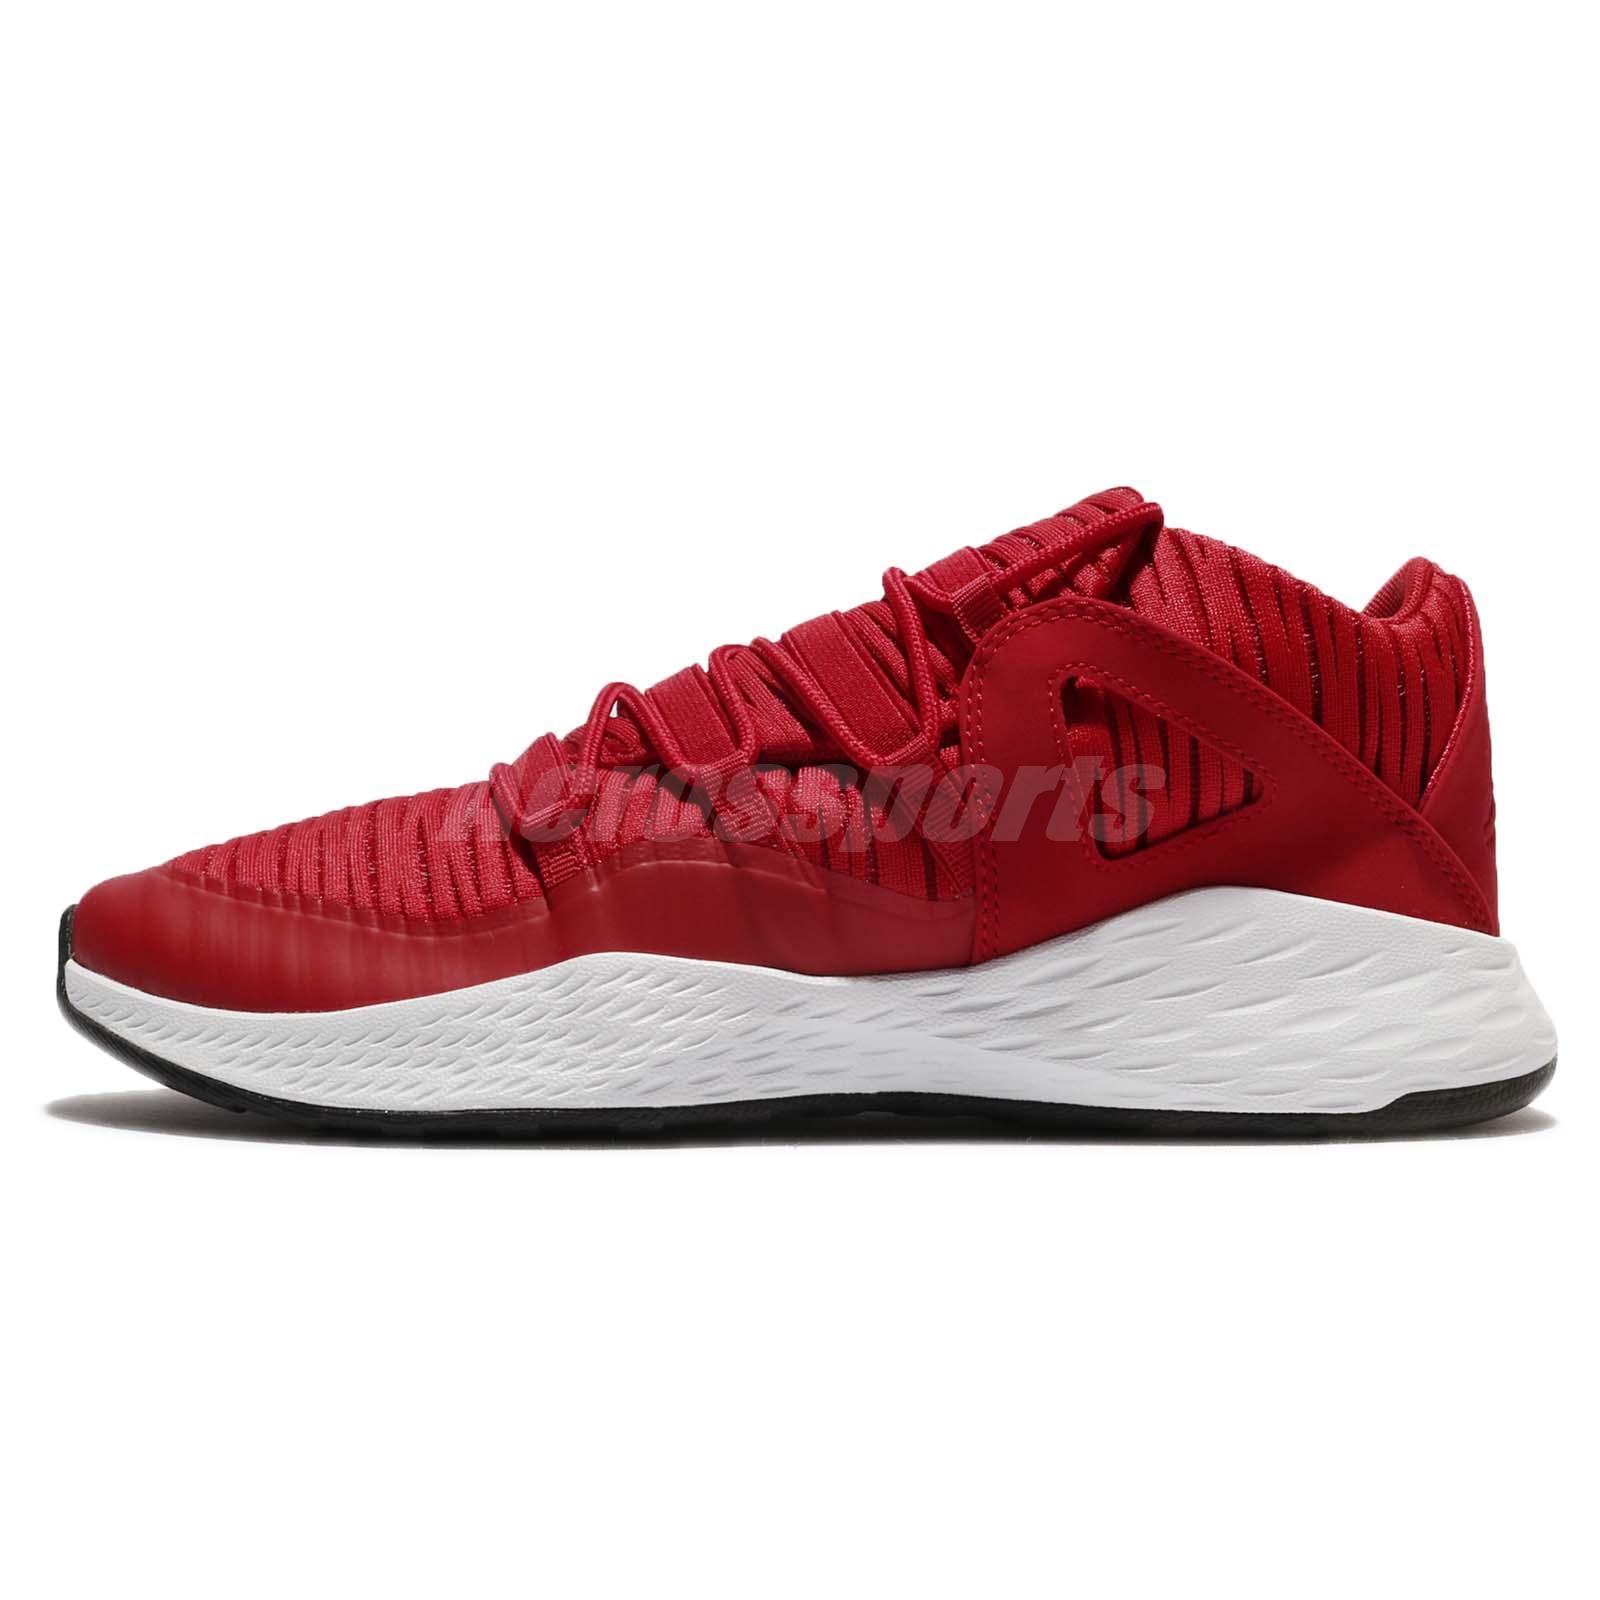 jordan formula 23 all red